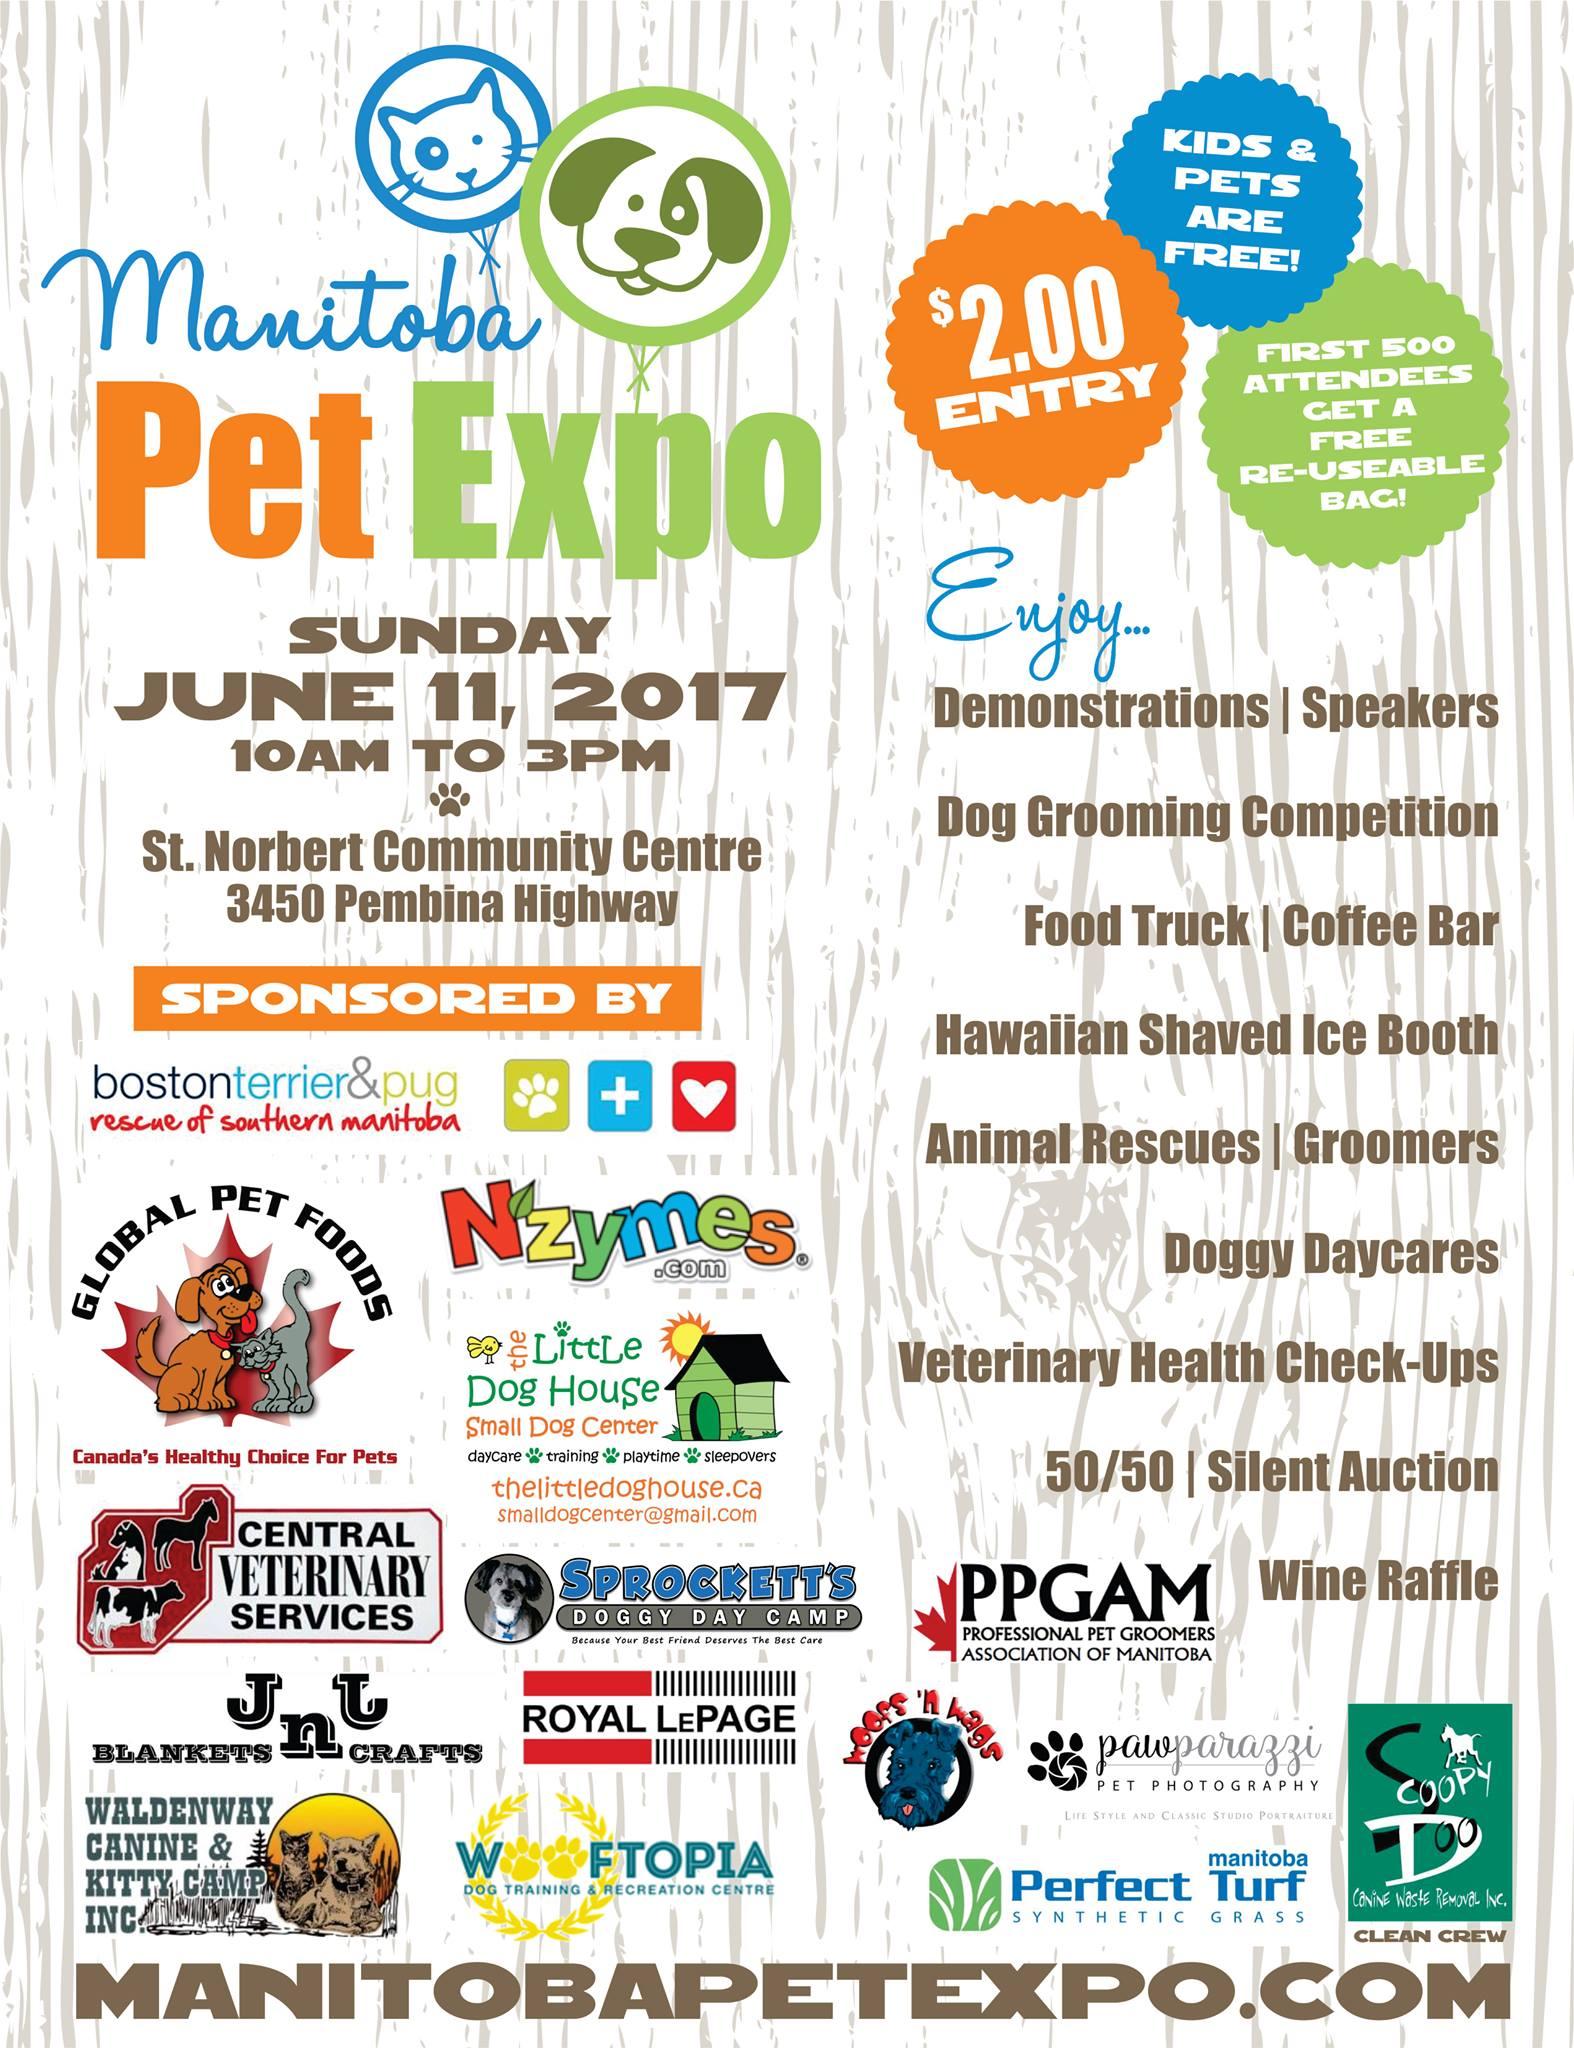 Manitoba Pet Expo 2017